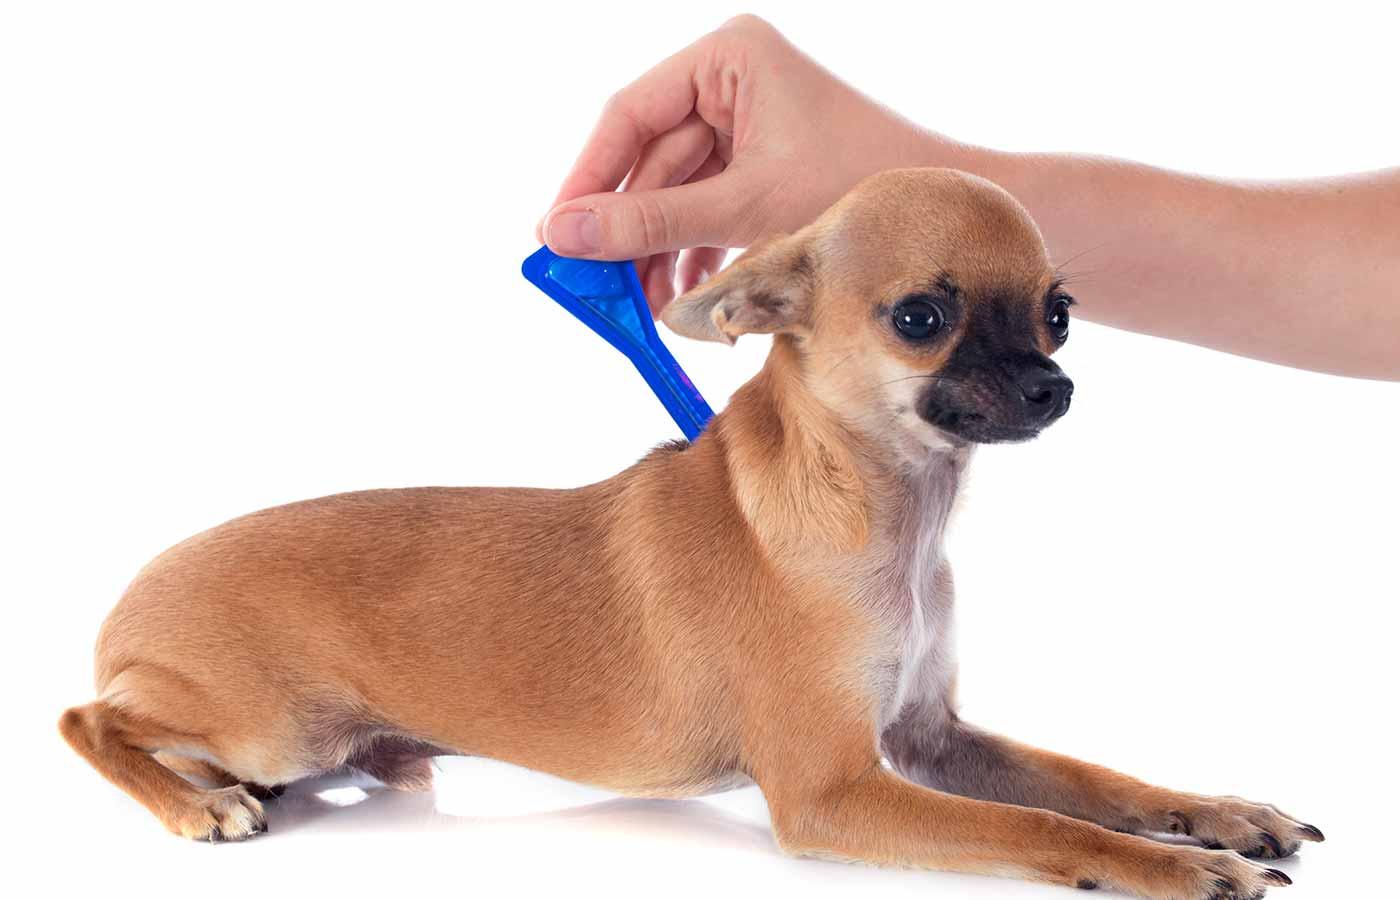 Perro de compañía antiparasitario con pipeta